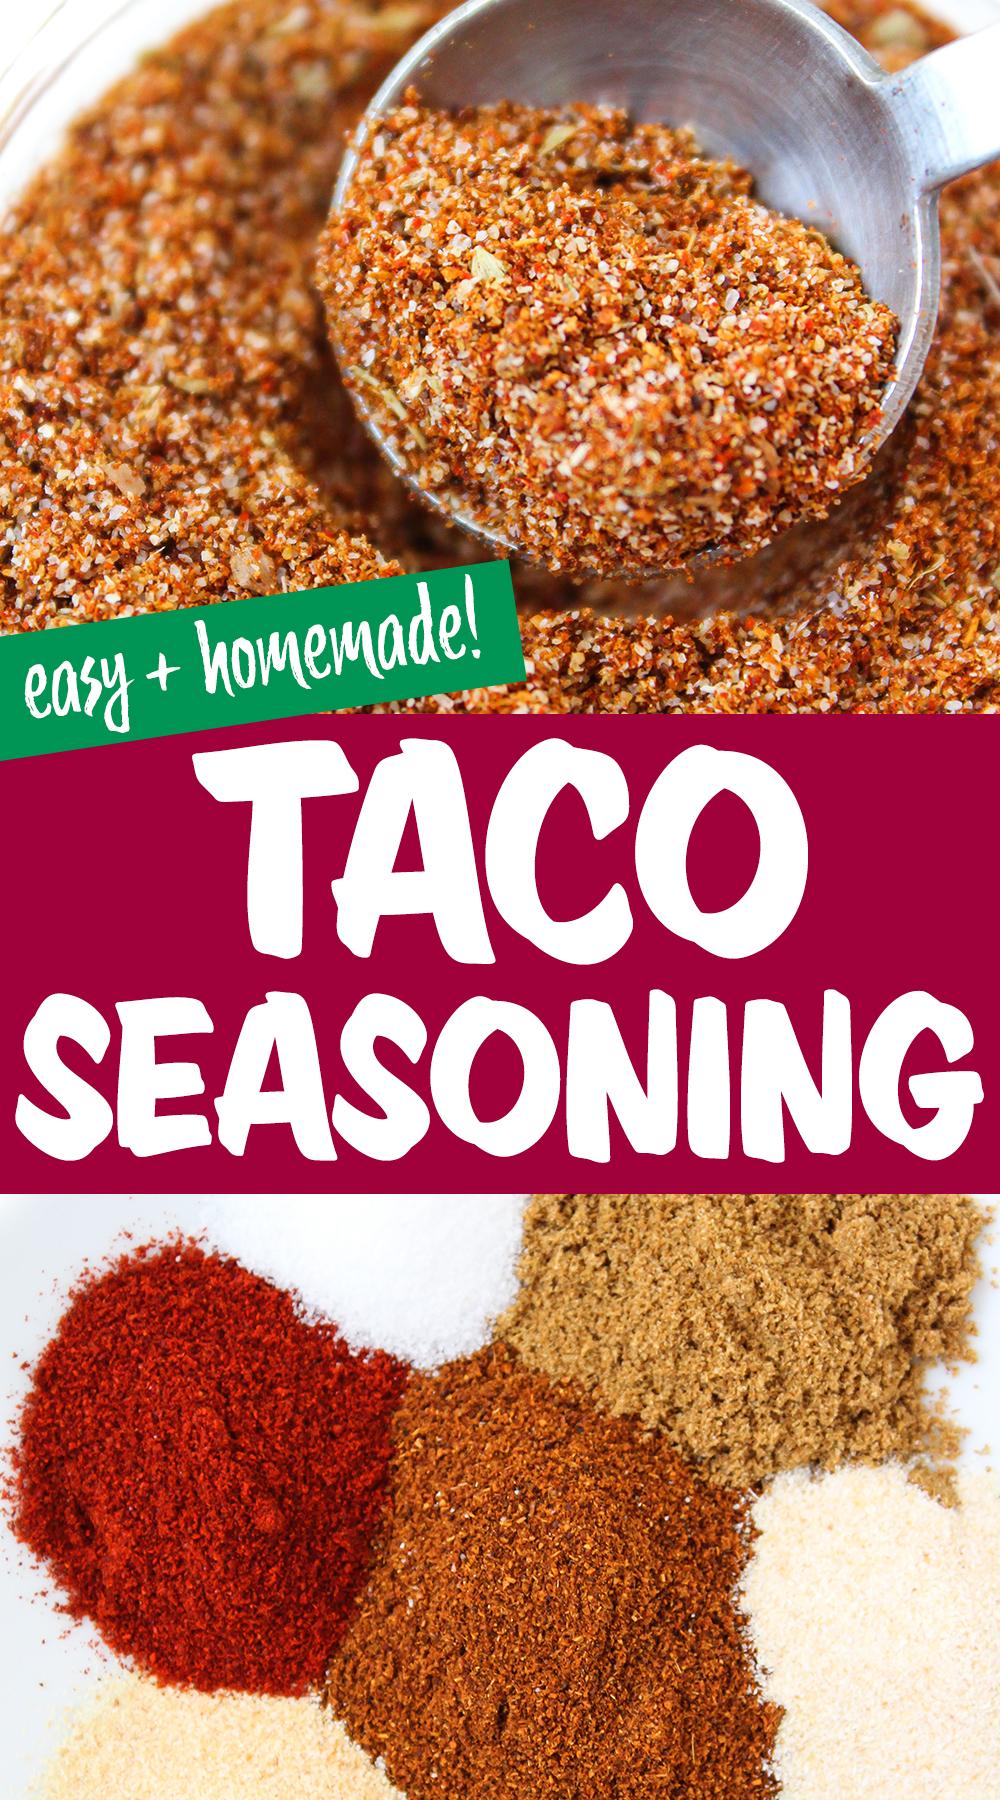 taco seasoning photo collage